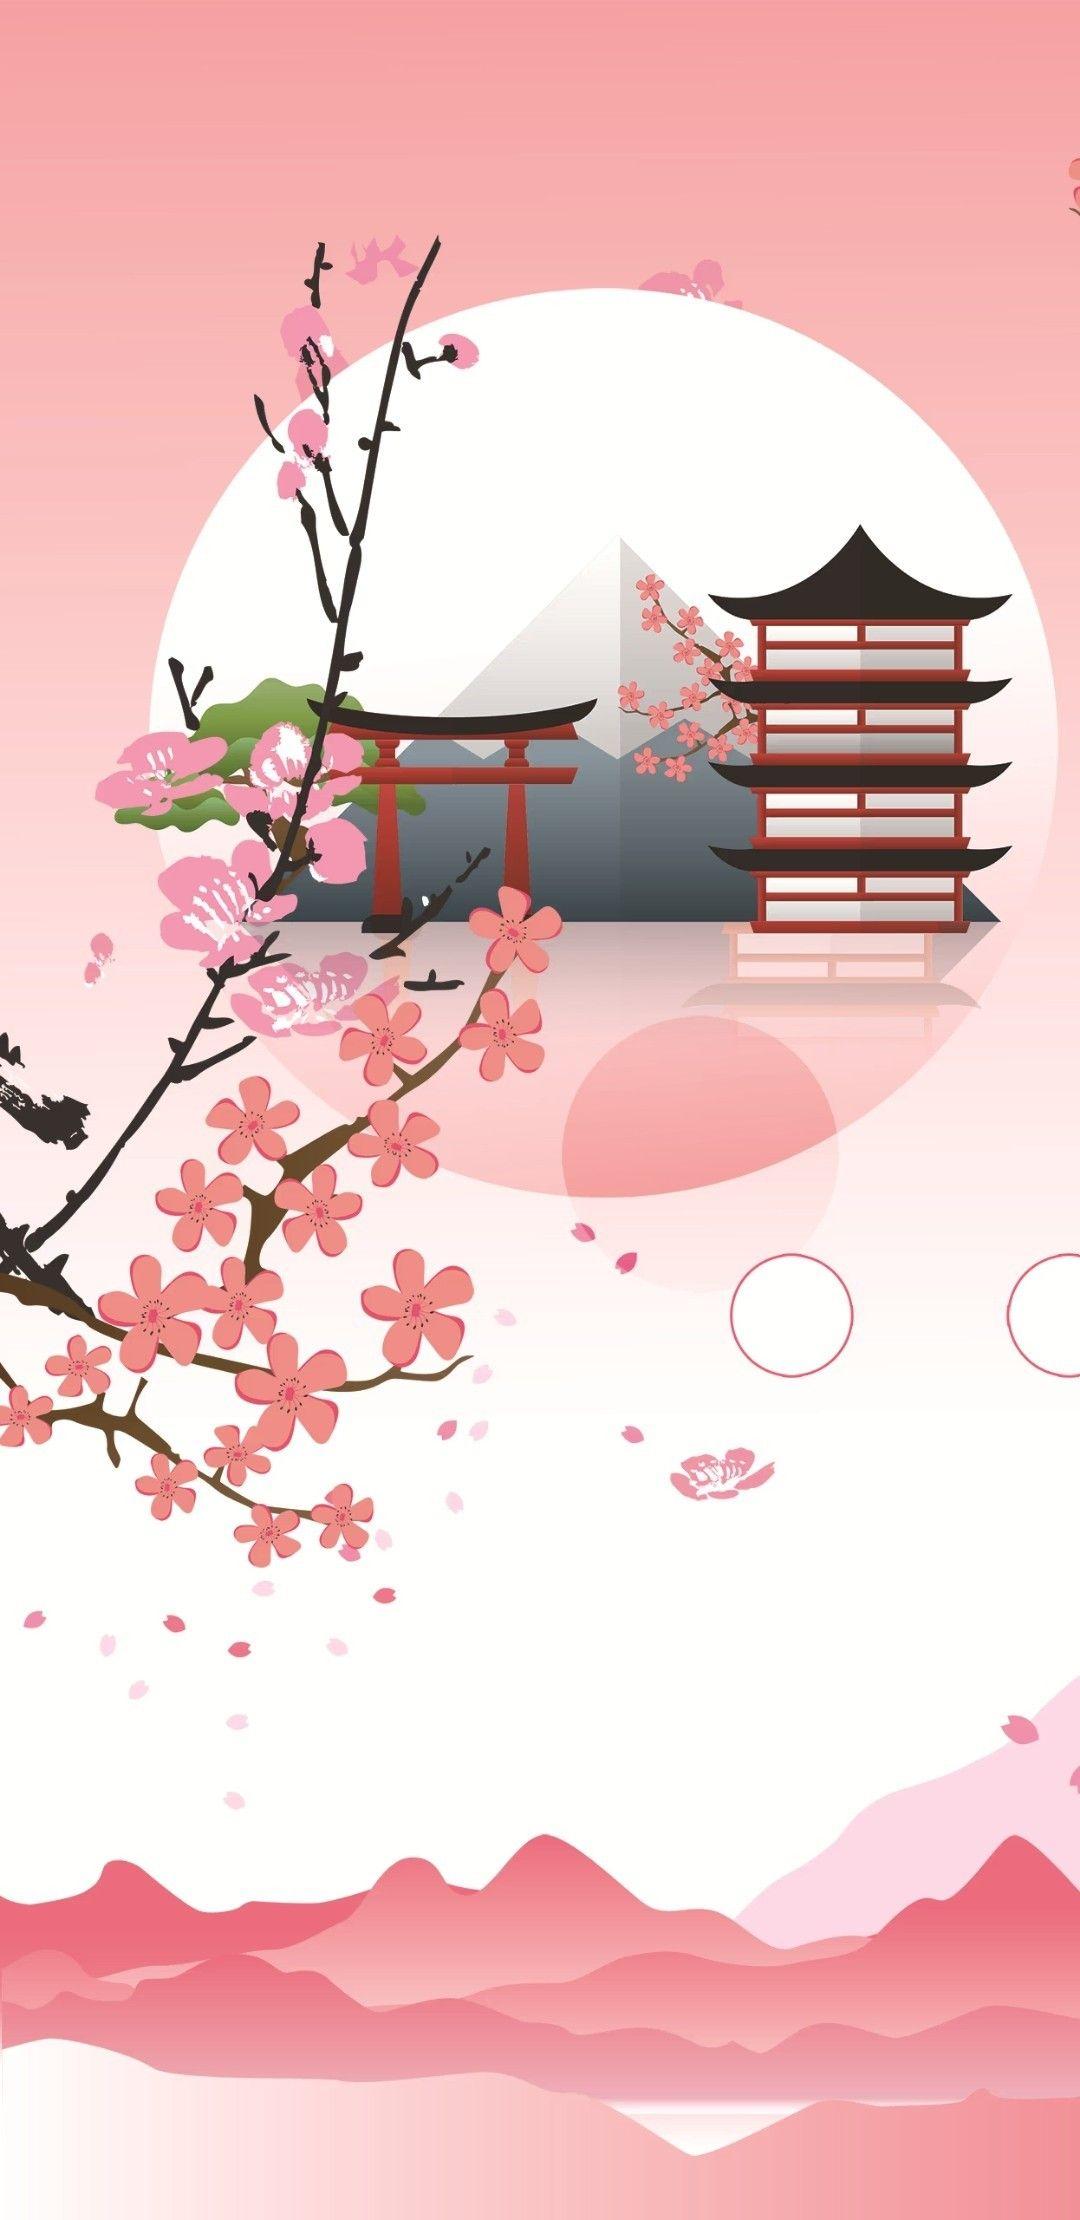 Pin By Glen On Japanese Cherry Blossom Wallpaper Kawaii Wallpaper Cherry Blossom Wallpaper Anime Wallpaper